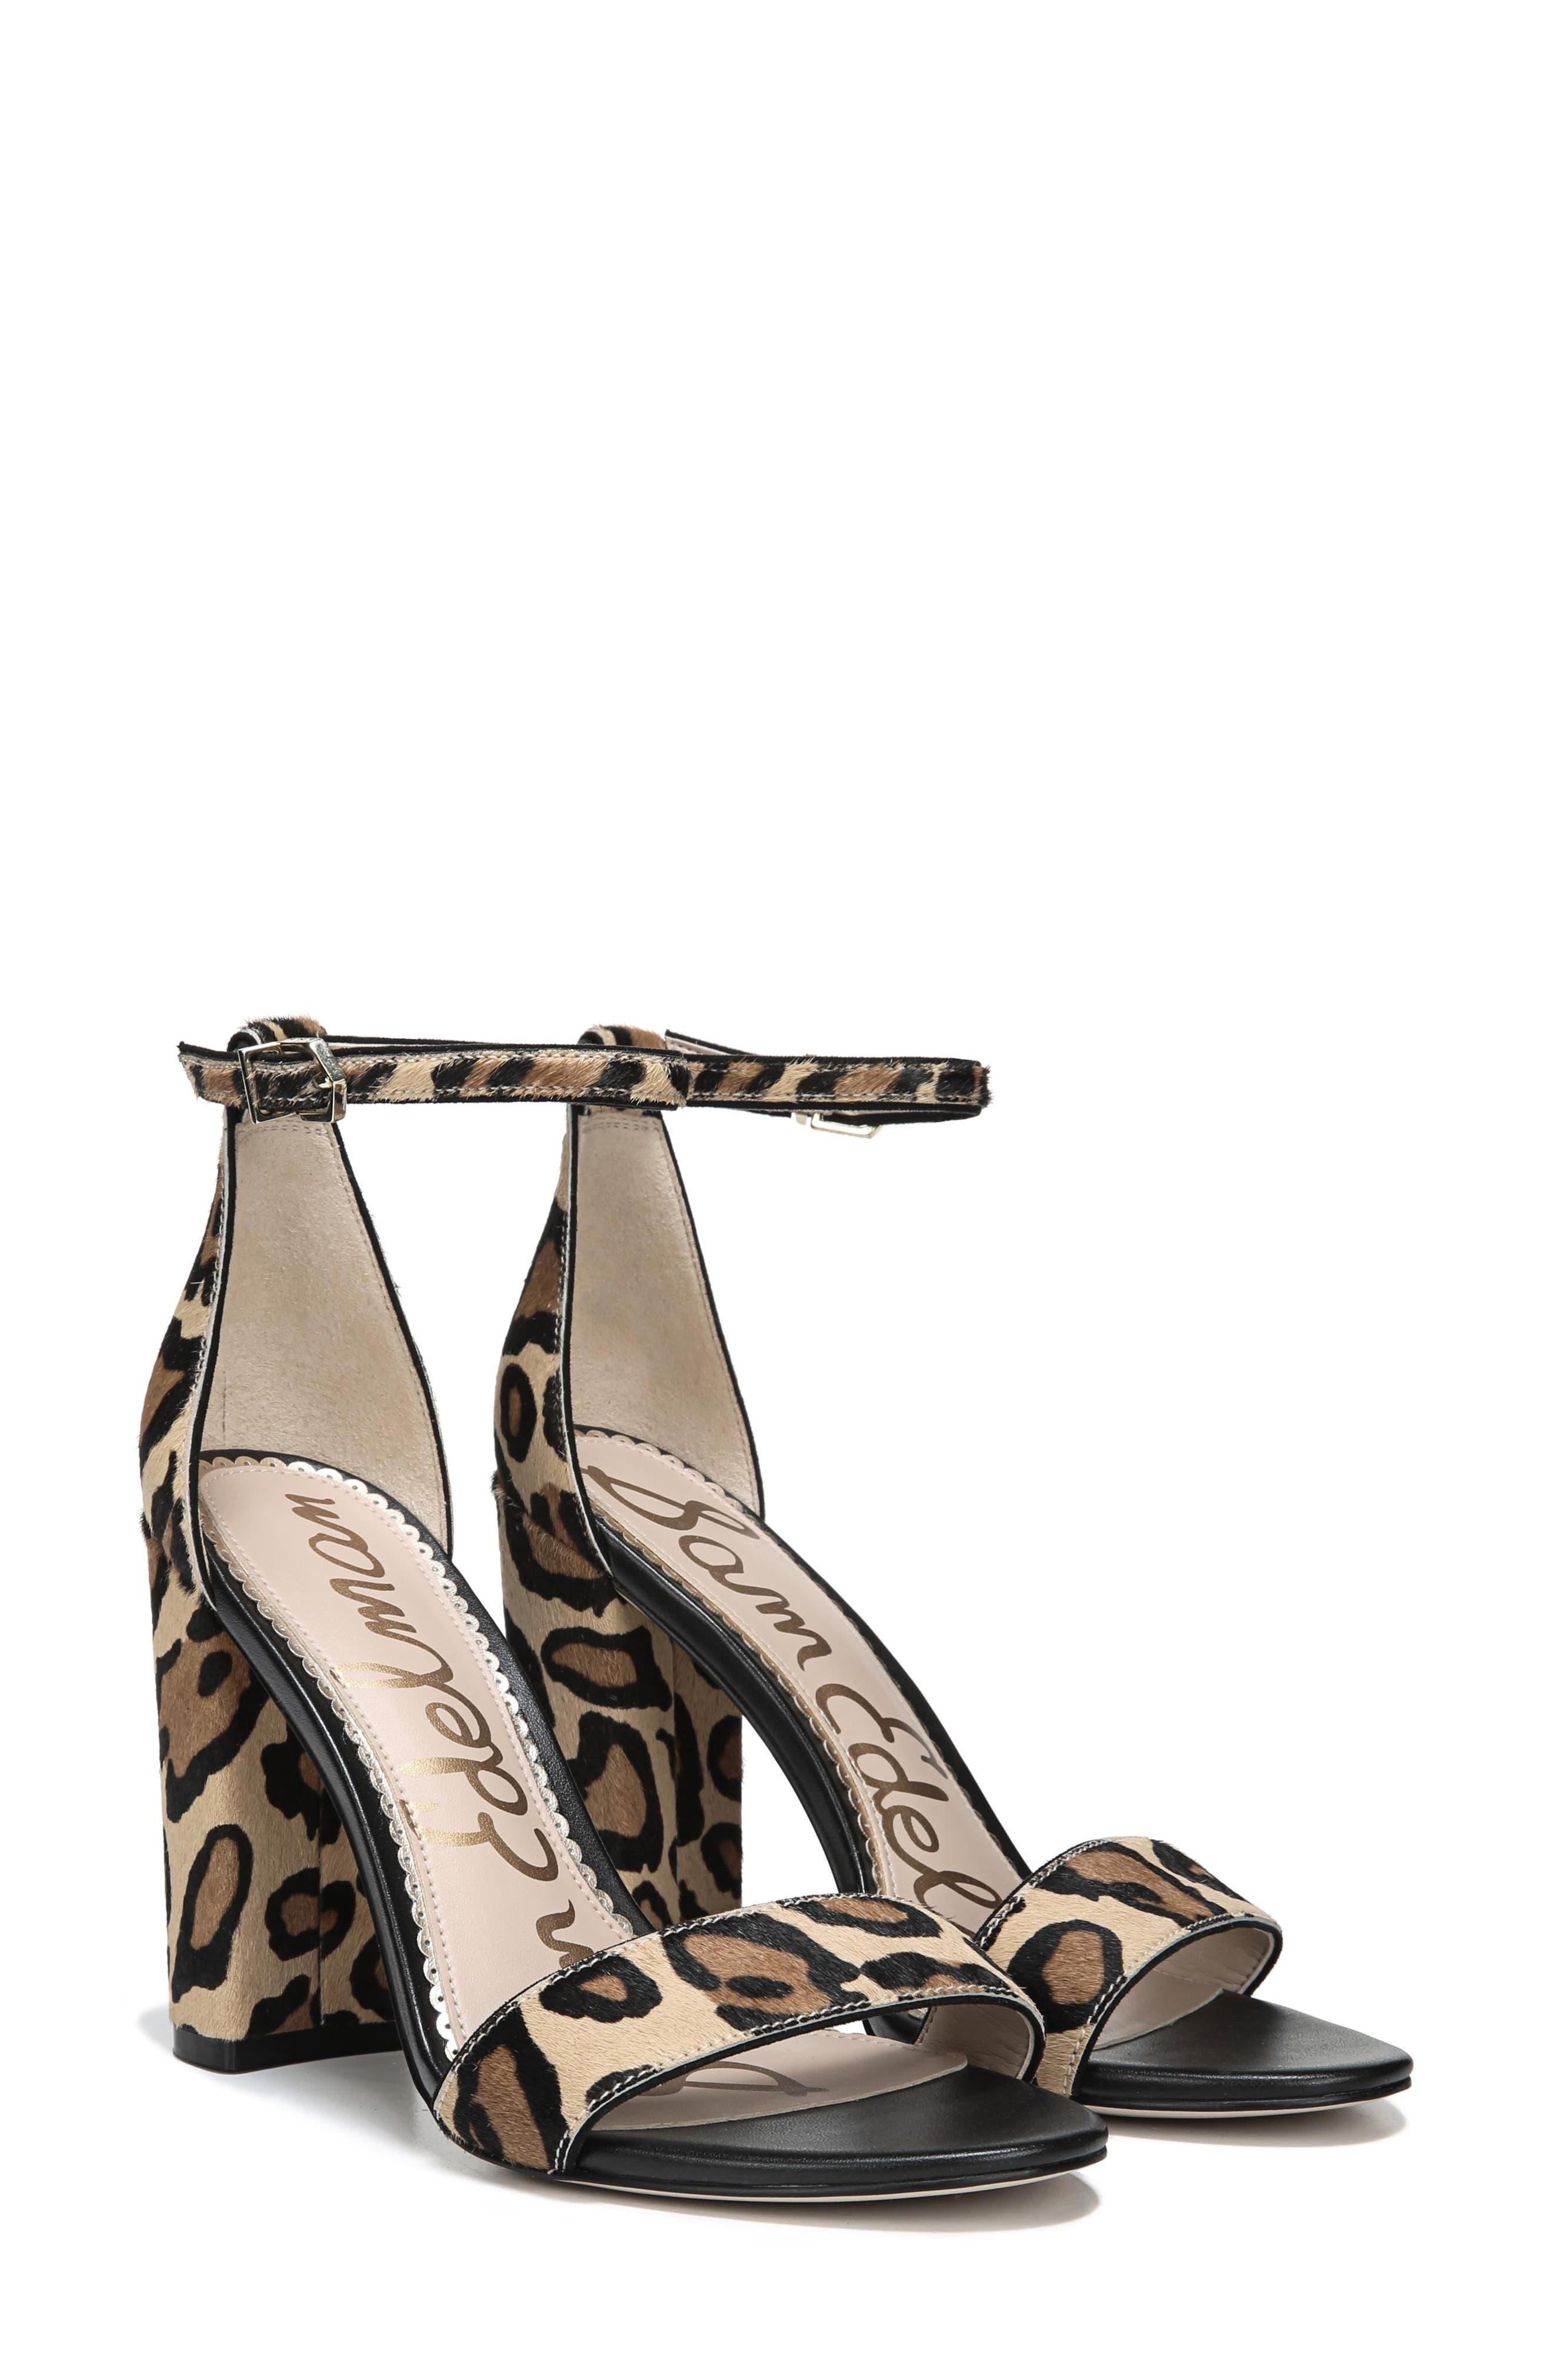 SAM EDELMAN Yaro Ankle Strap Sandal, Main, color, NEW NUDE LEOPARD CALF HAIR